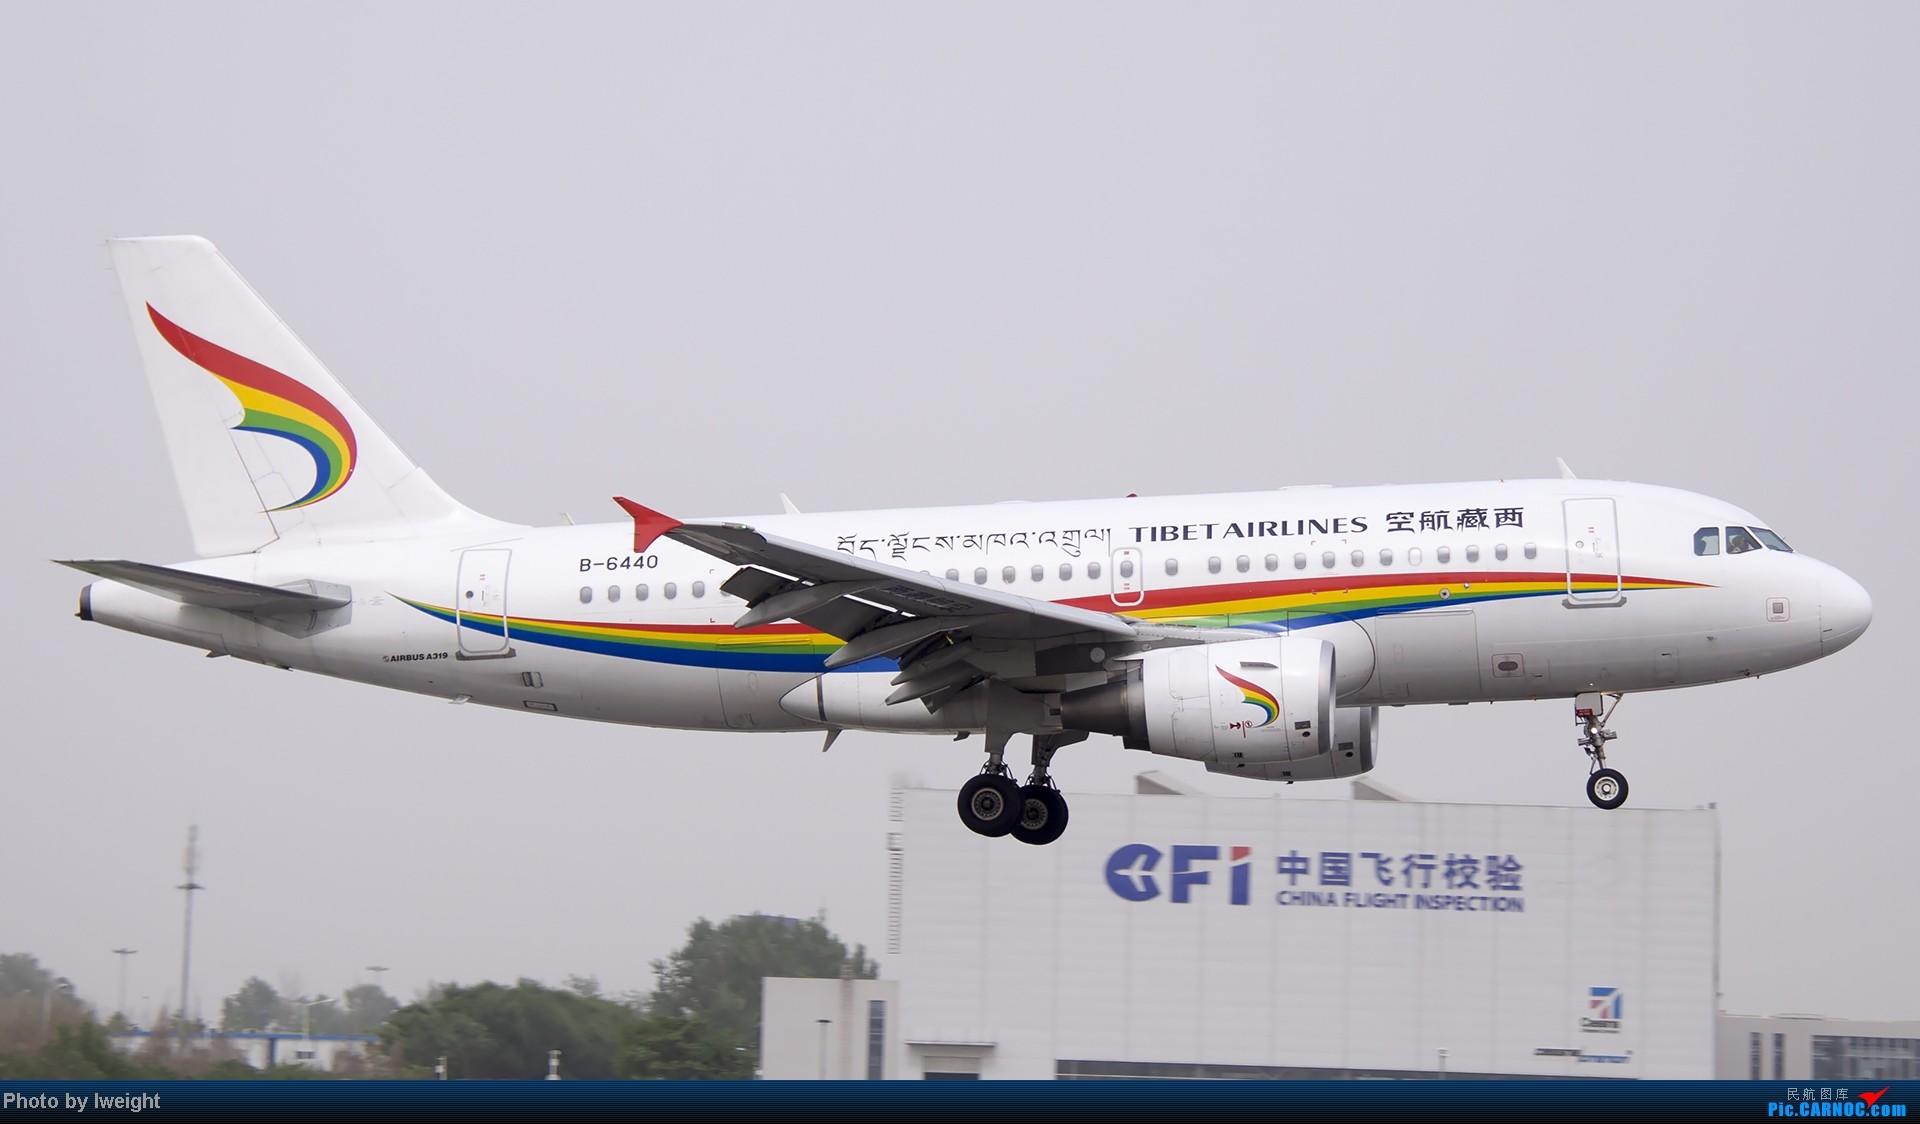 Re:[原创]霾天首都机场随拍 AIRBUS A319-100 B-6440 中国北京首都机场